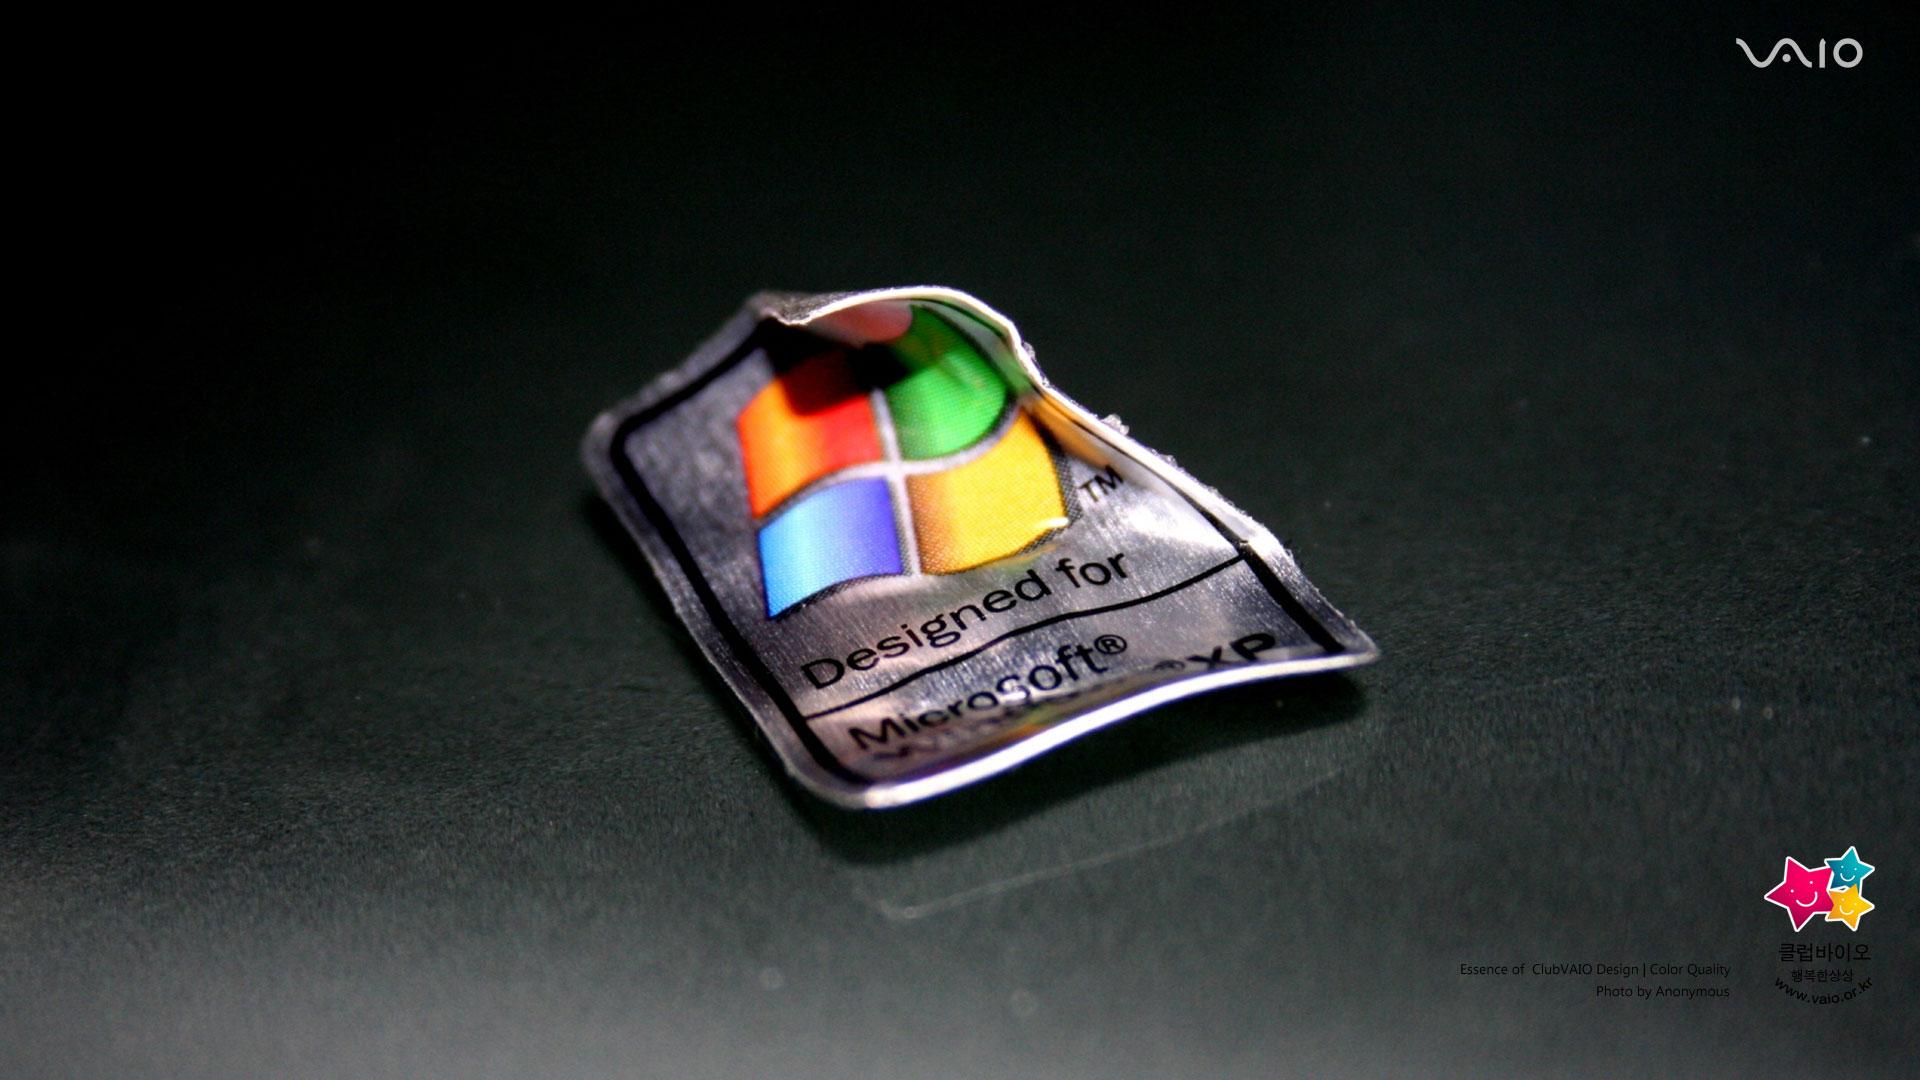 Windows Xp Wallpaper 1280X1024 134275 1920x1080